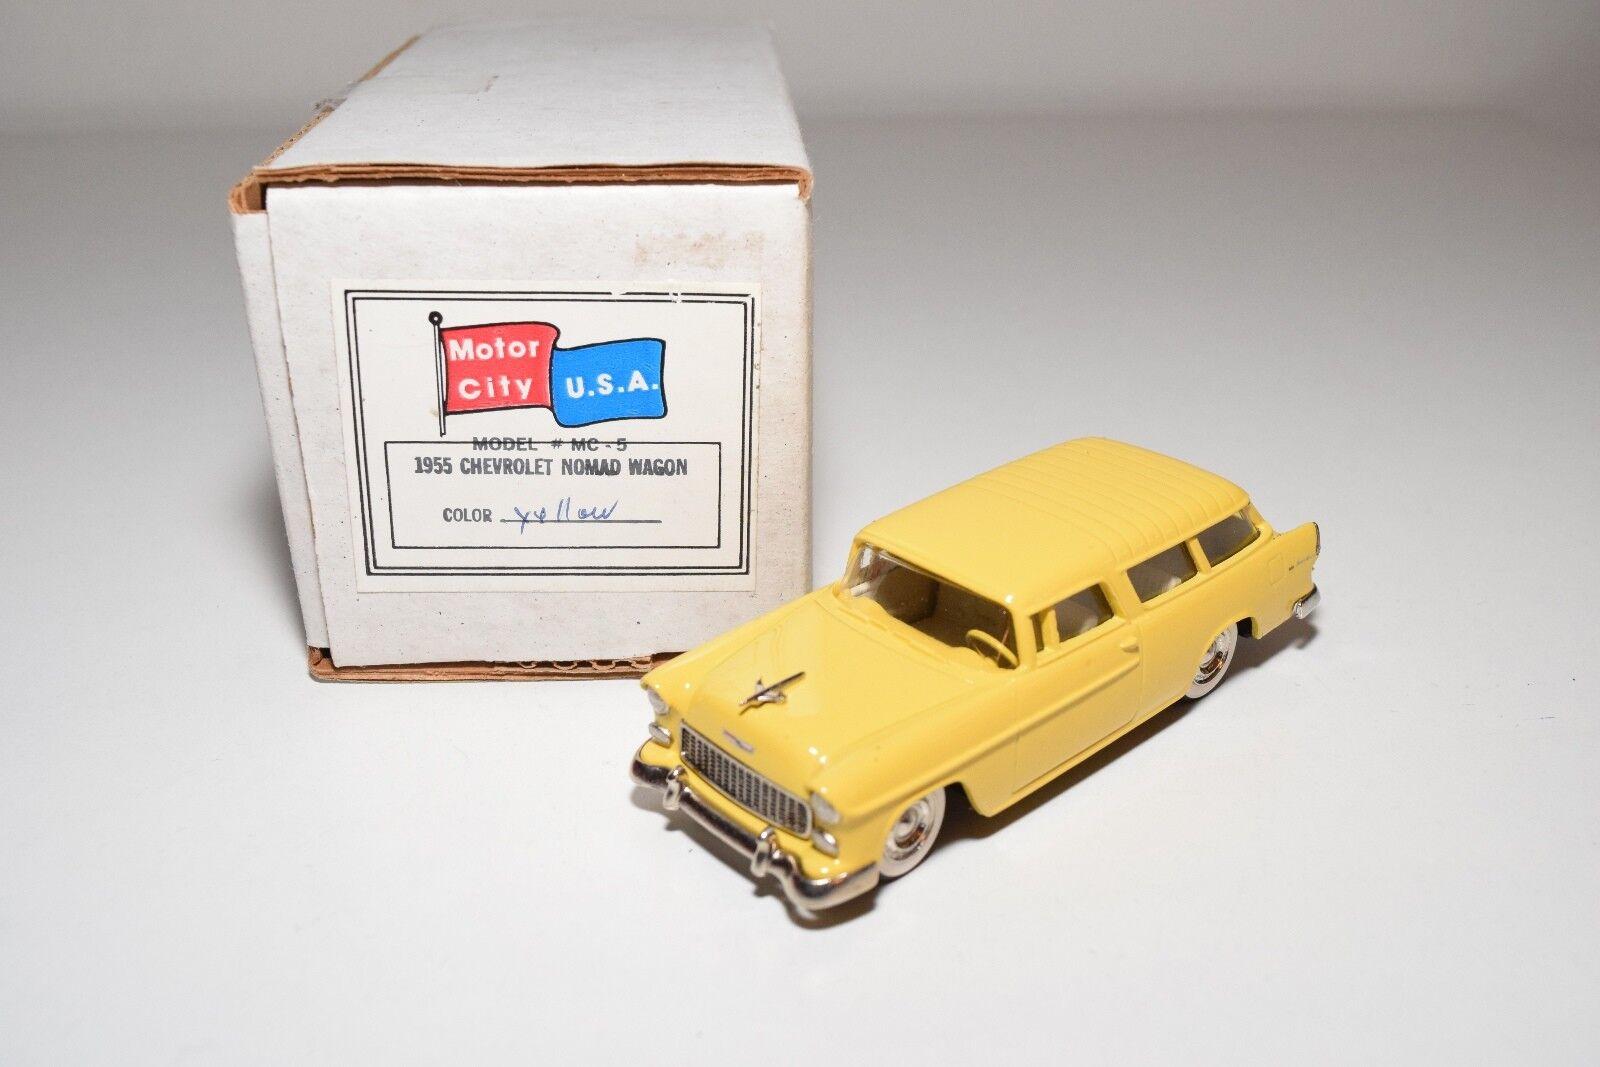 U.S.A. MODELS MOTOR CITY MC-5 CHEVROLET NOMAD WAGON 1955 amarillo MINT BOXED